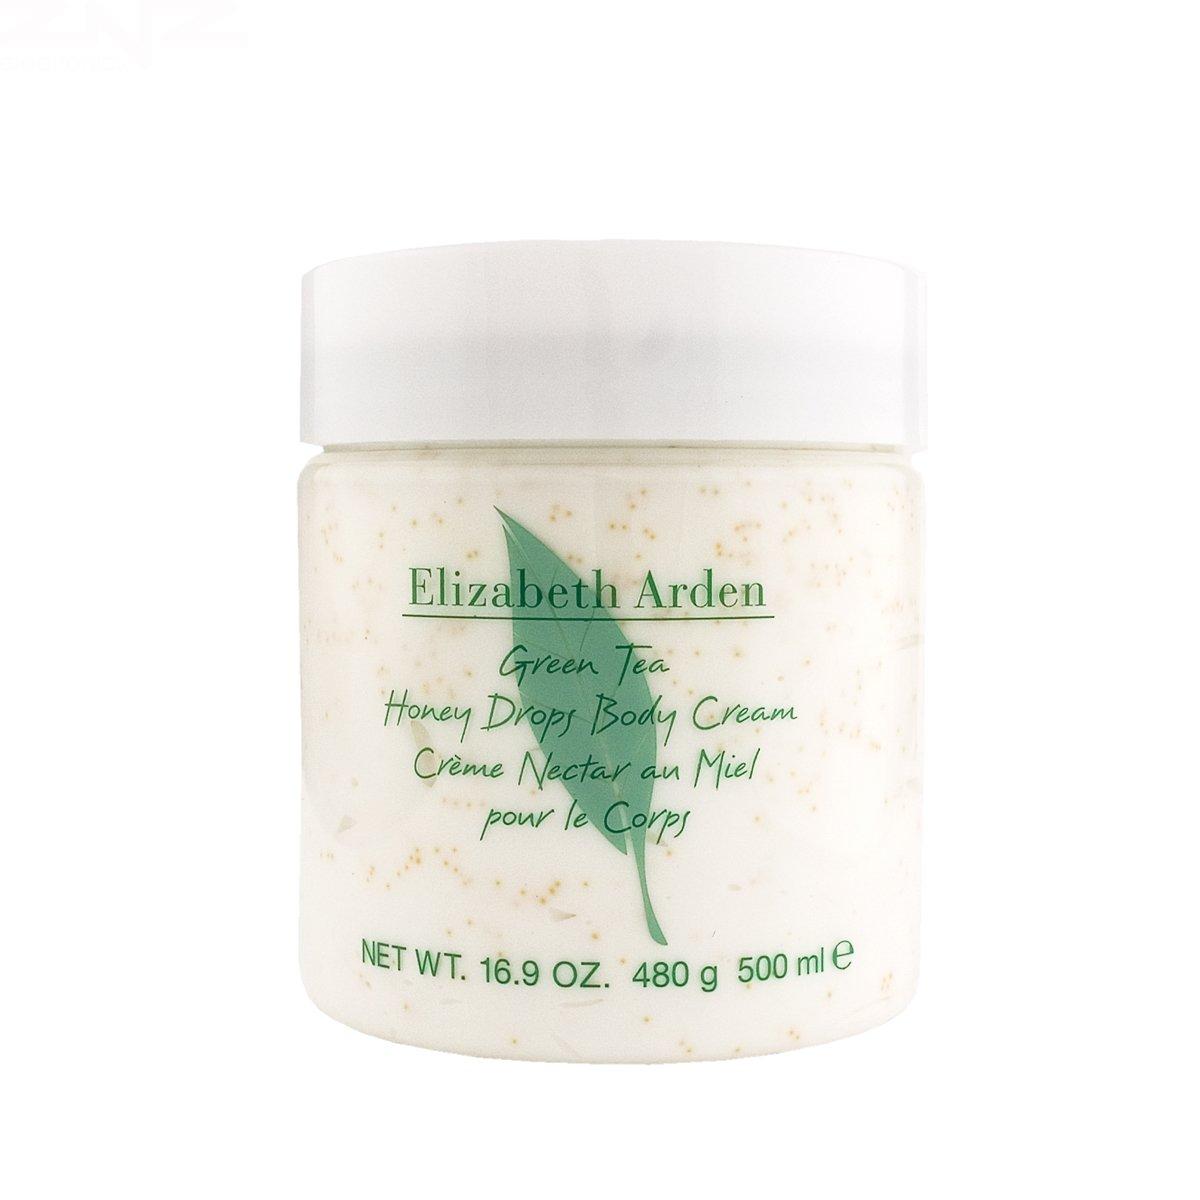 Elizabeth Arden Green Tea Honey Drops Body Crema – 500 ml